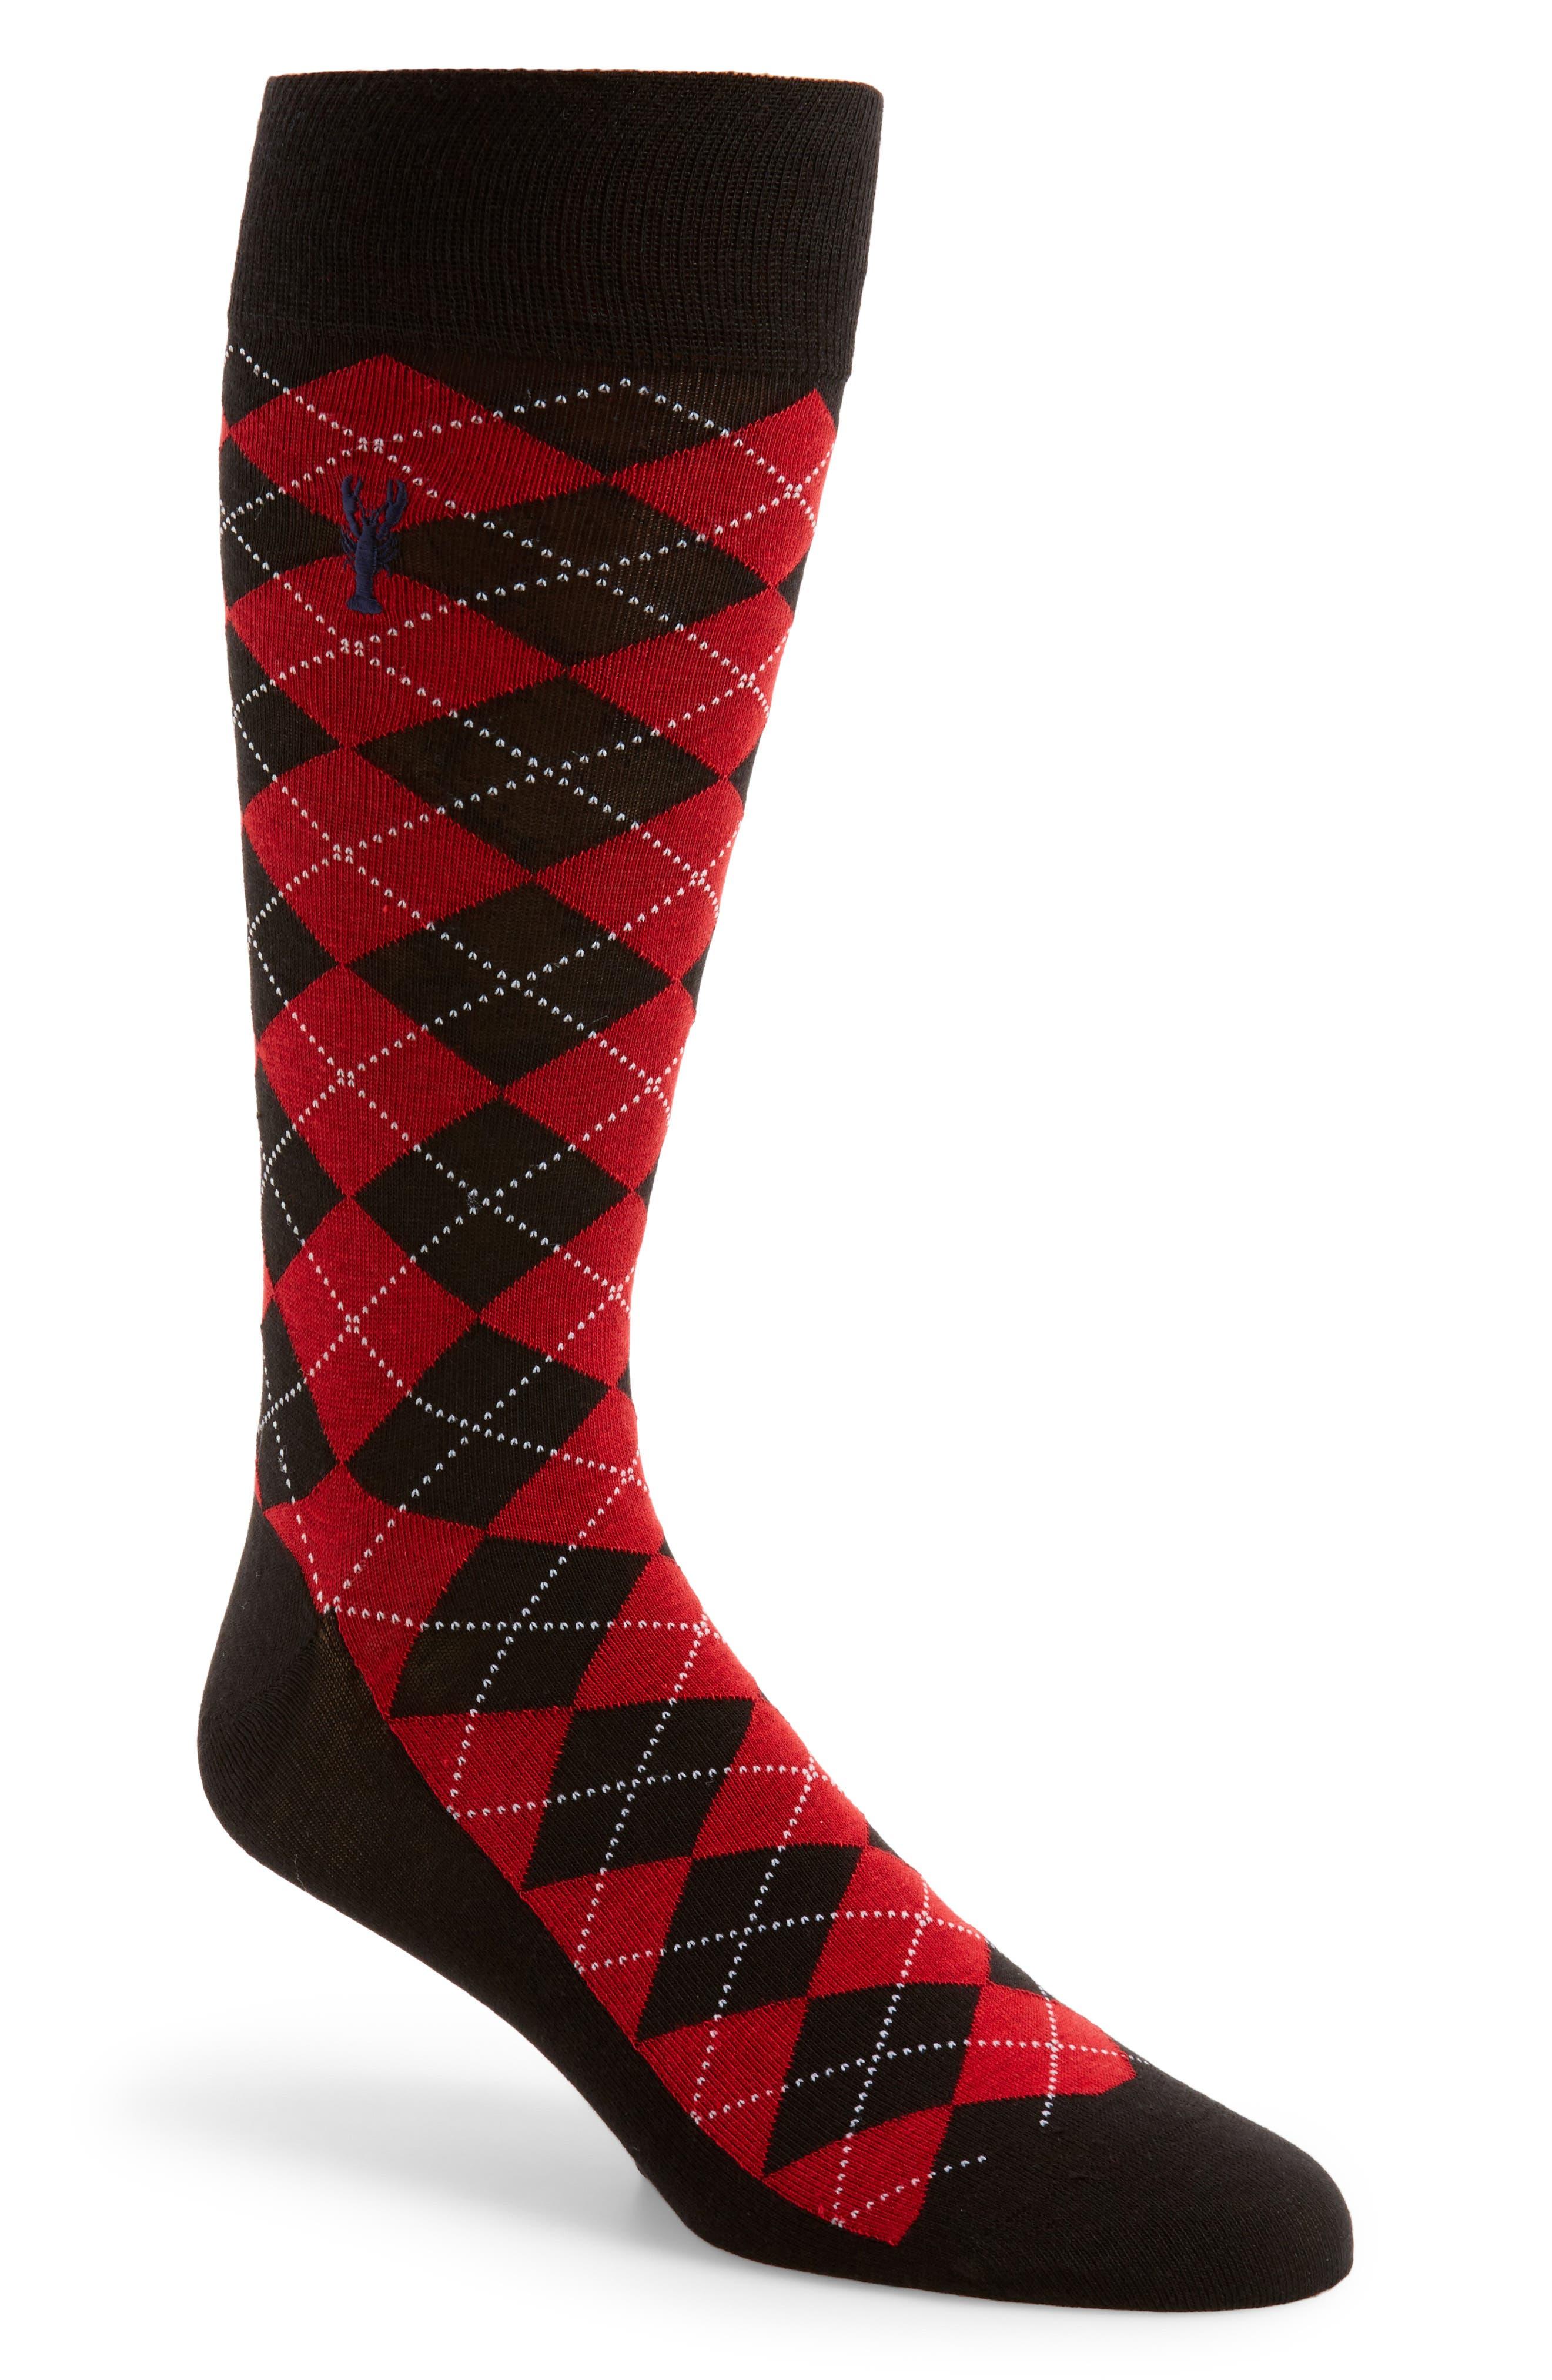 Pinch Argyle Socks,                         Main,                         color, Black/ Red